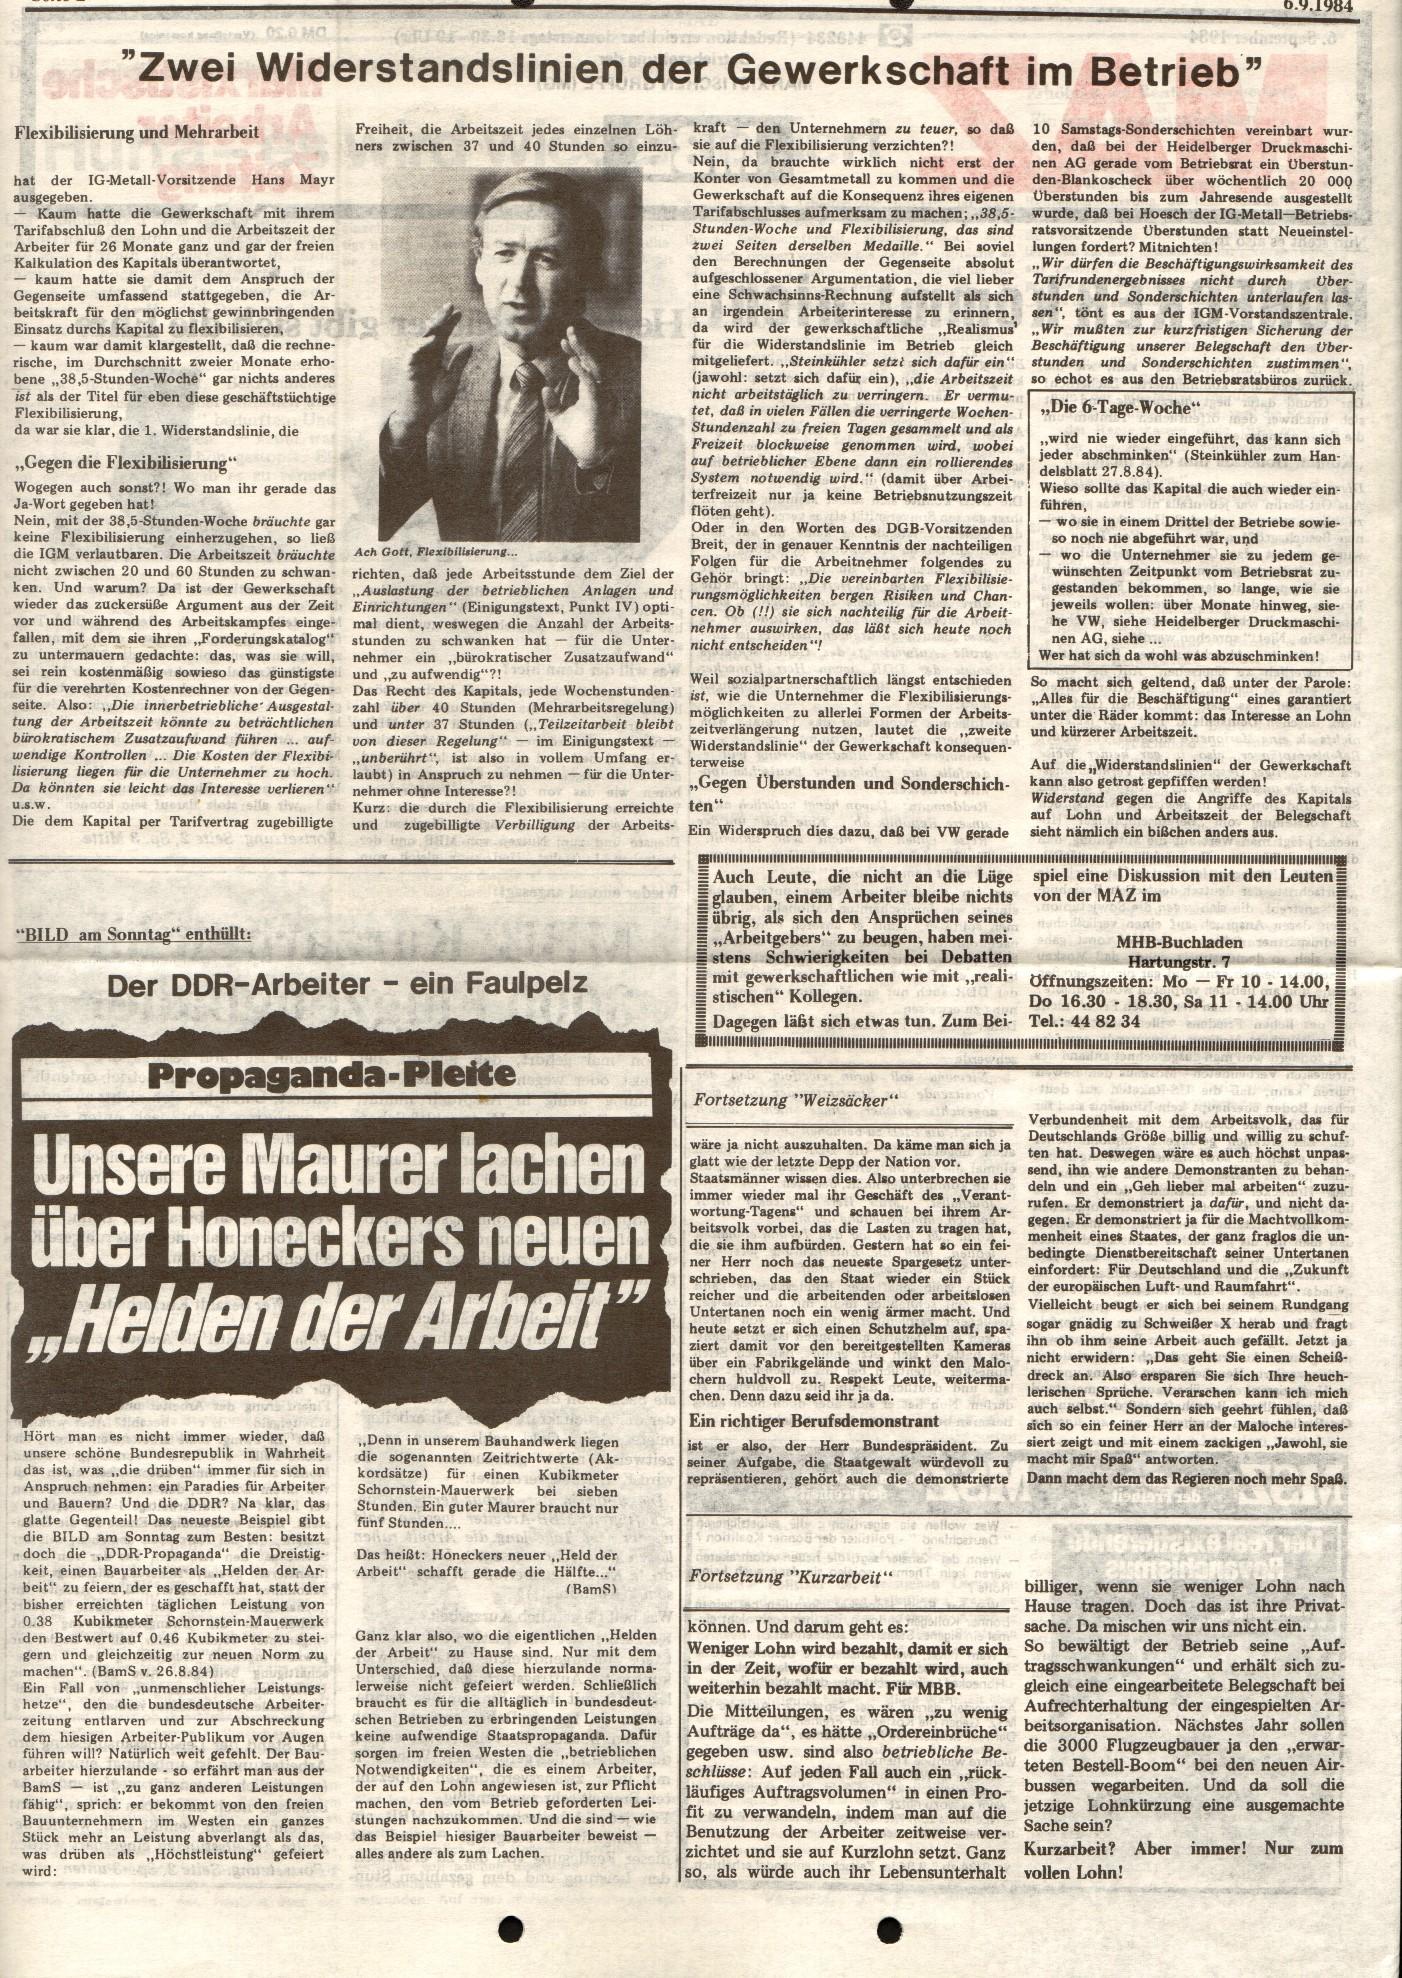 Hamburg_MG_MAZ_MBB_19840906_02